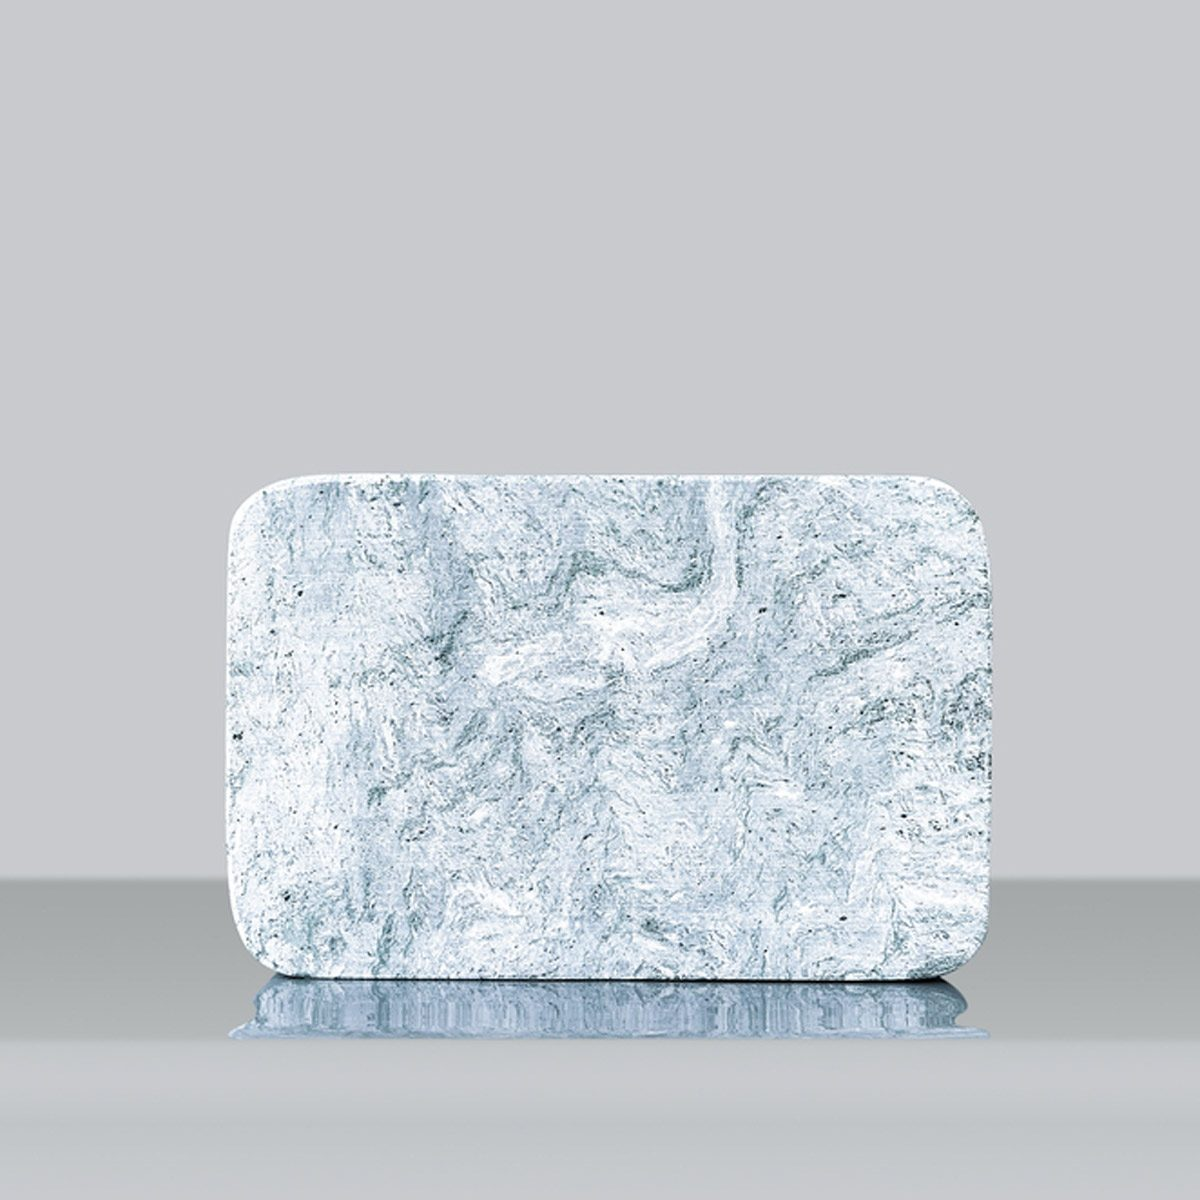 dfh9_shutterstock_363501530 soapstone